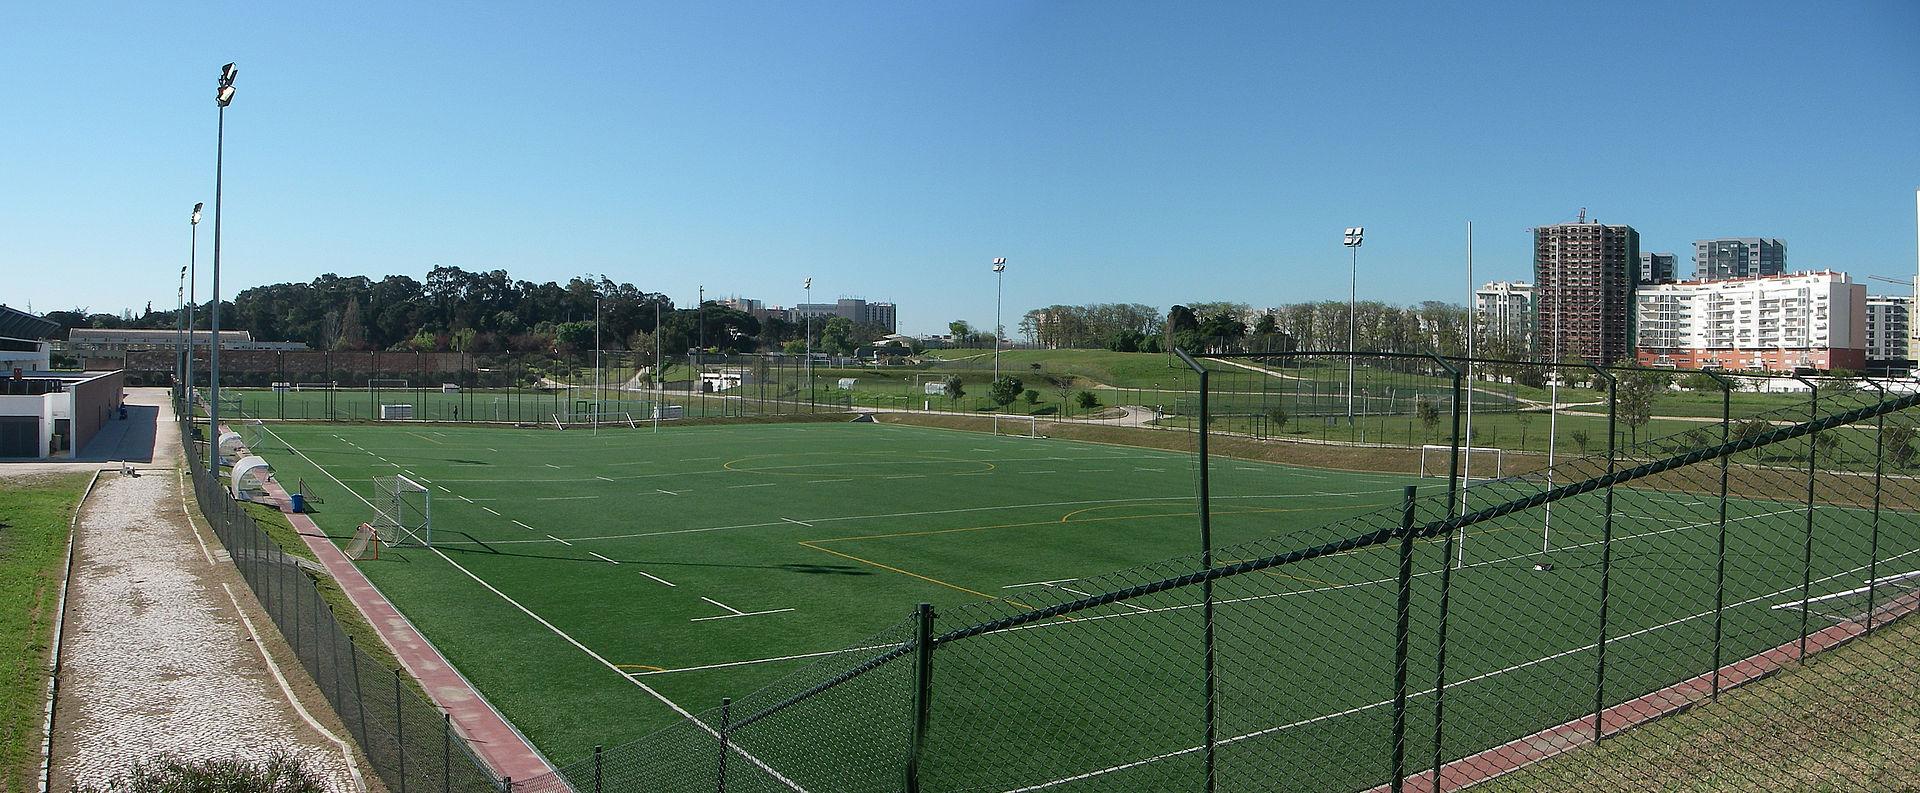 Est dio universit rio de lisboa wikipedia for Puerta 9 estadio universitario